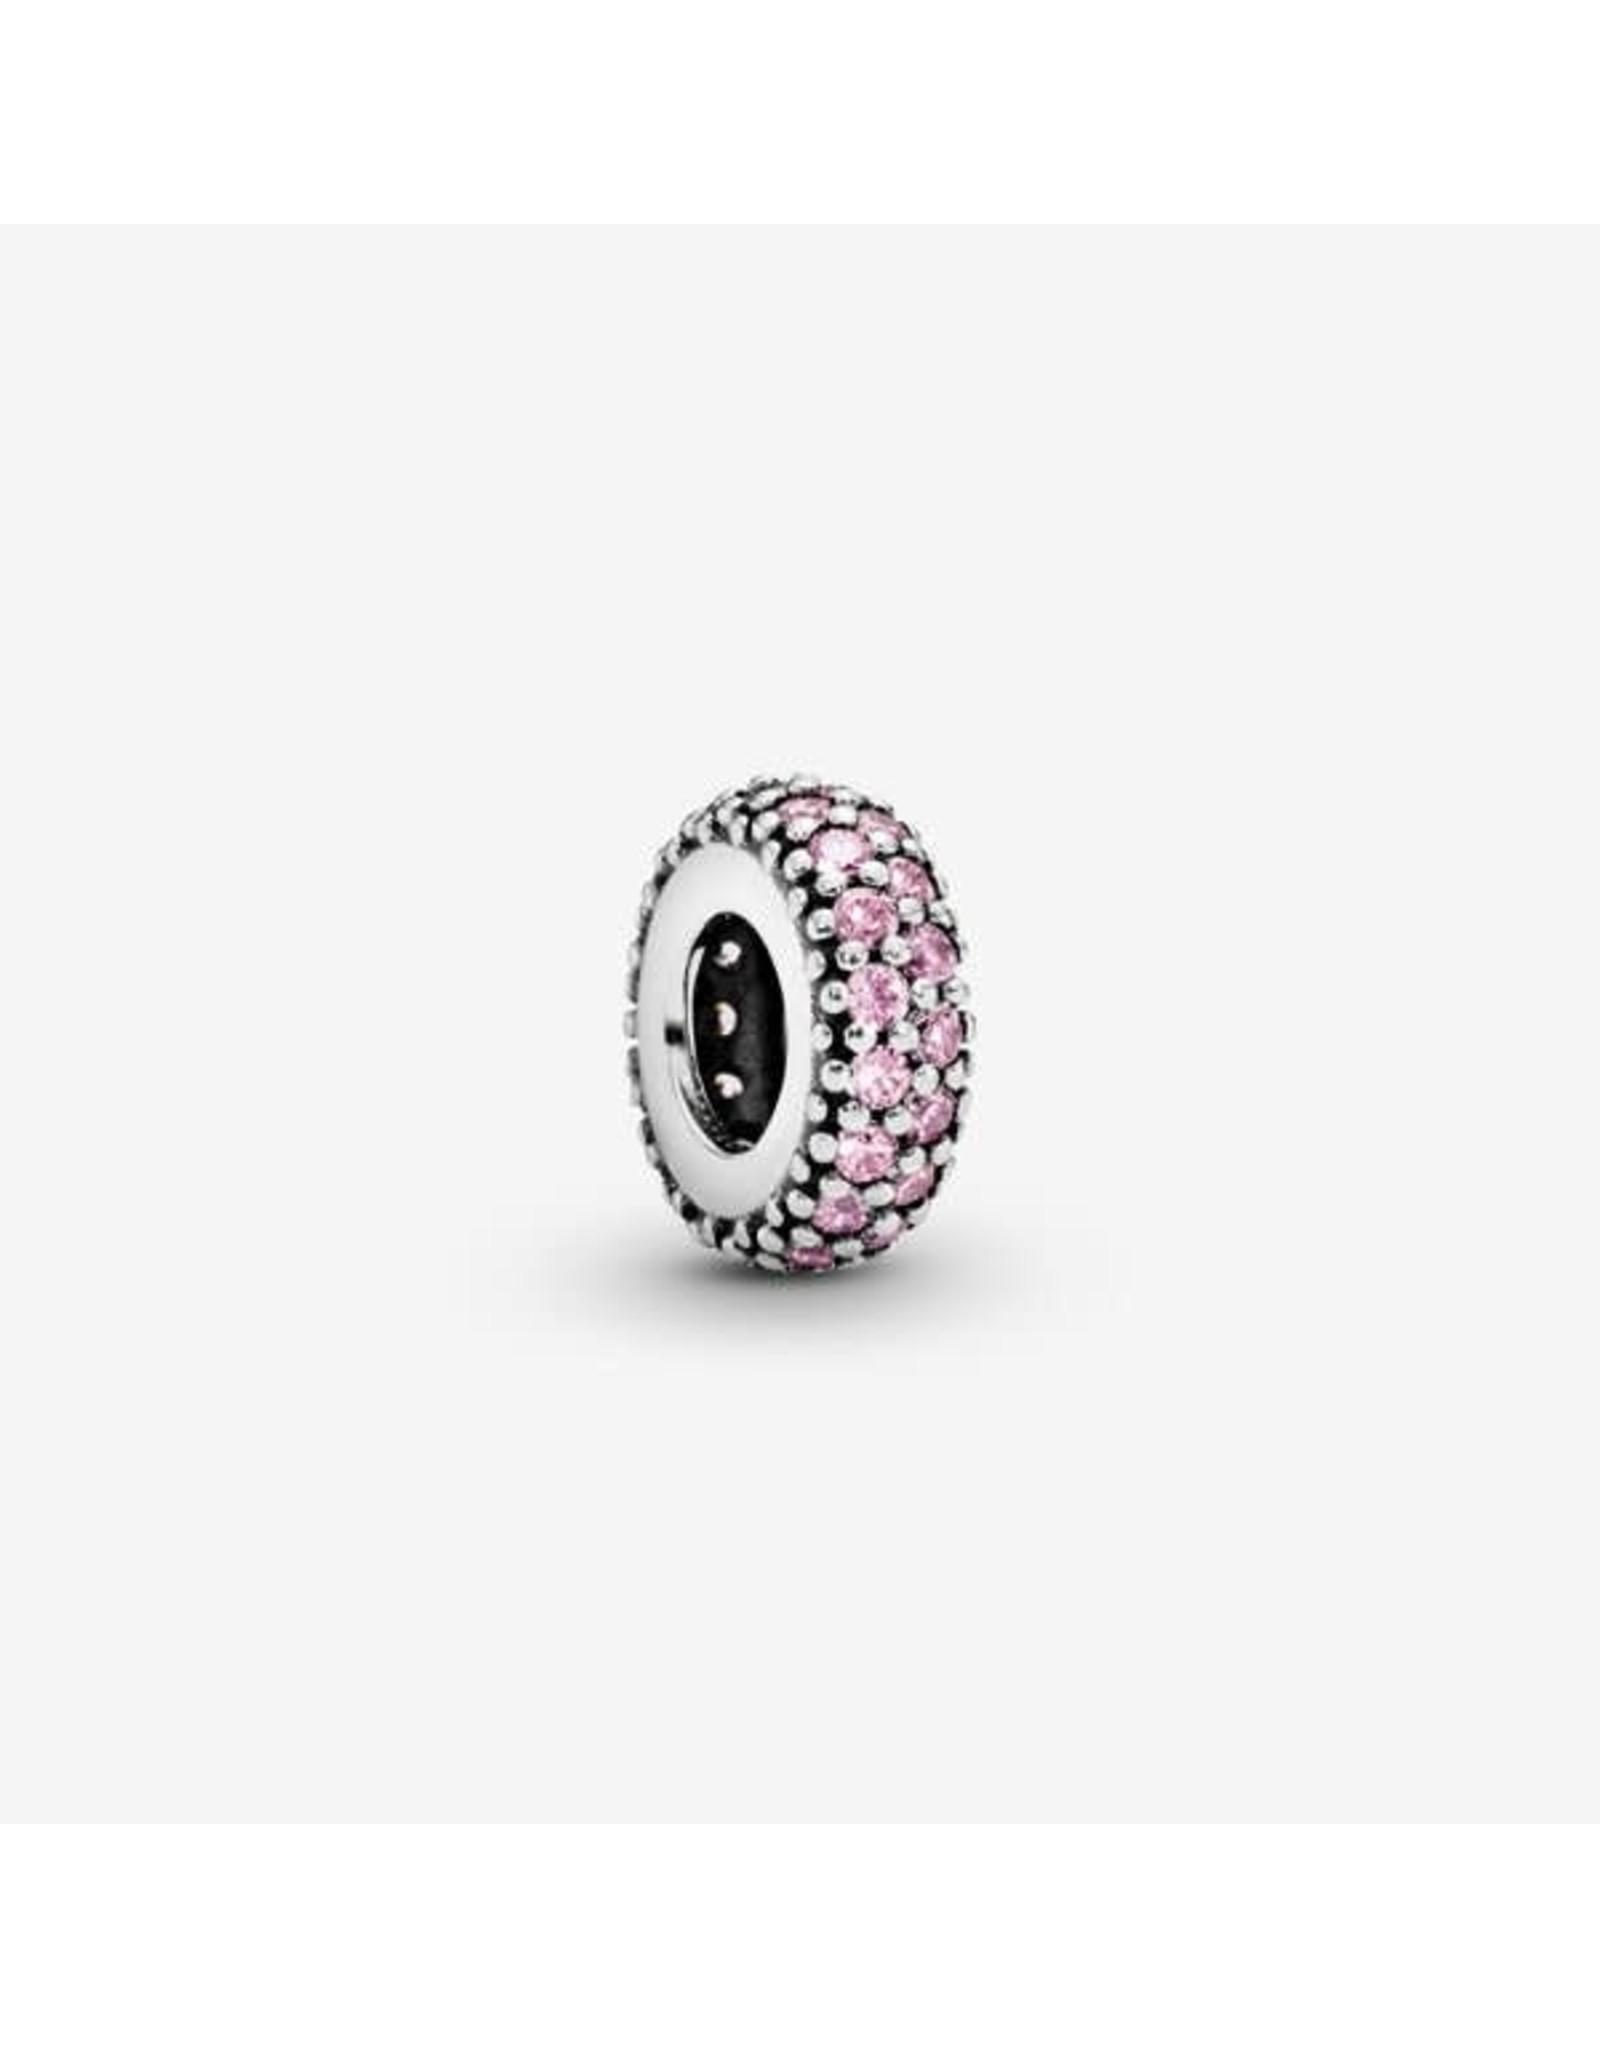 Pandora Pandora Spacer, Inspiration Within, Pink CZ